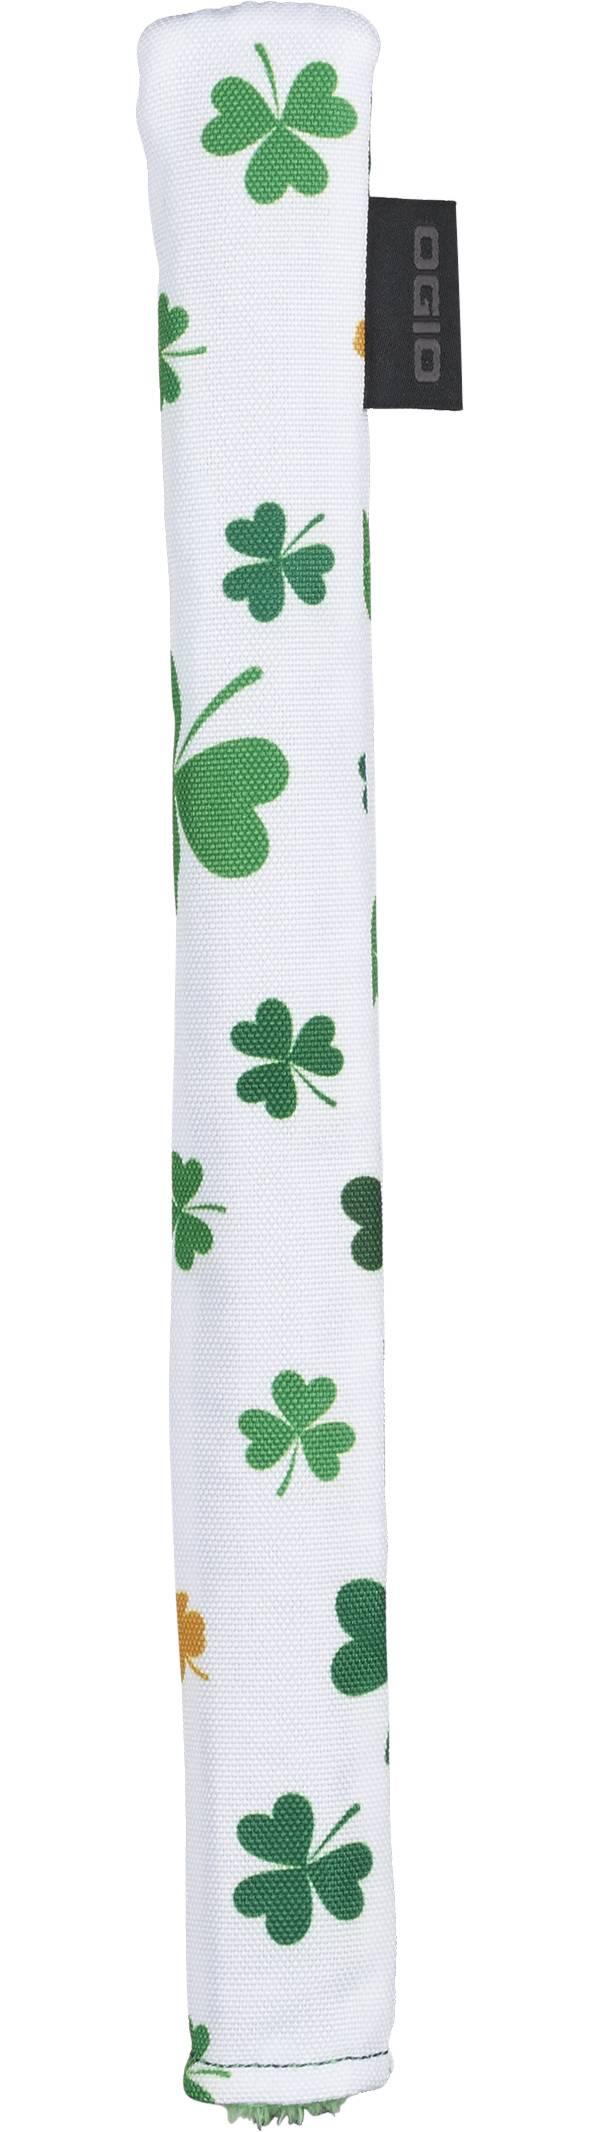 OGIO Shamrock Alignment Stick Cover product image